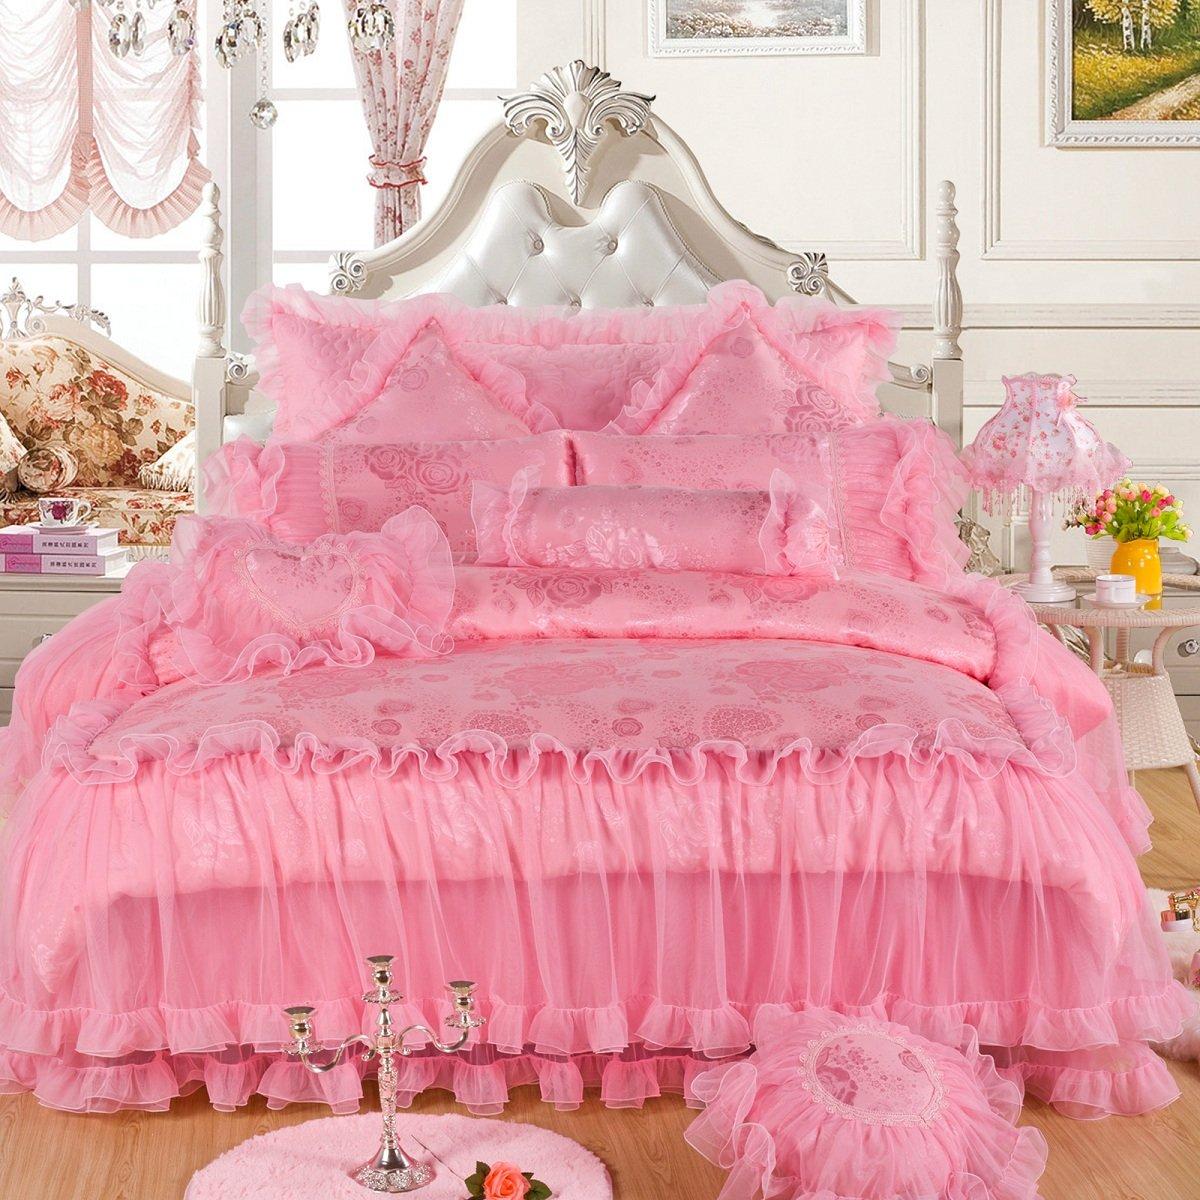 Jacquard Lace Princess Bedding Quilt Set For Wedding, Duvet Cover Set-King (4-Piece, Pink) by Alibasis